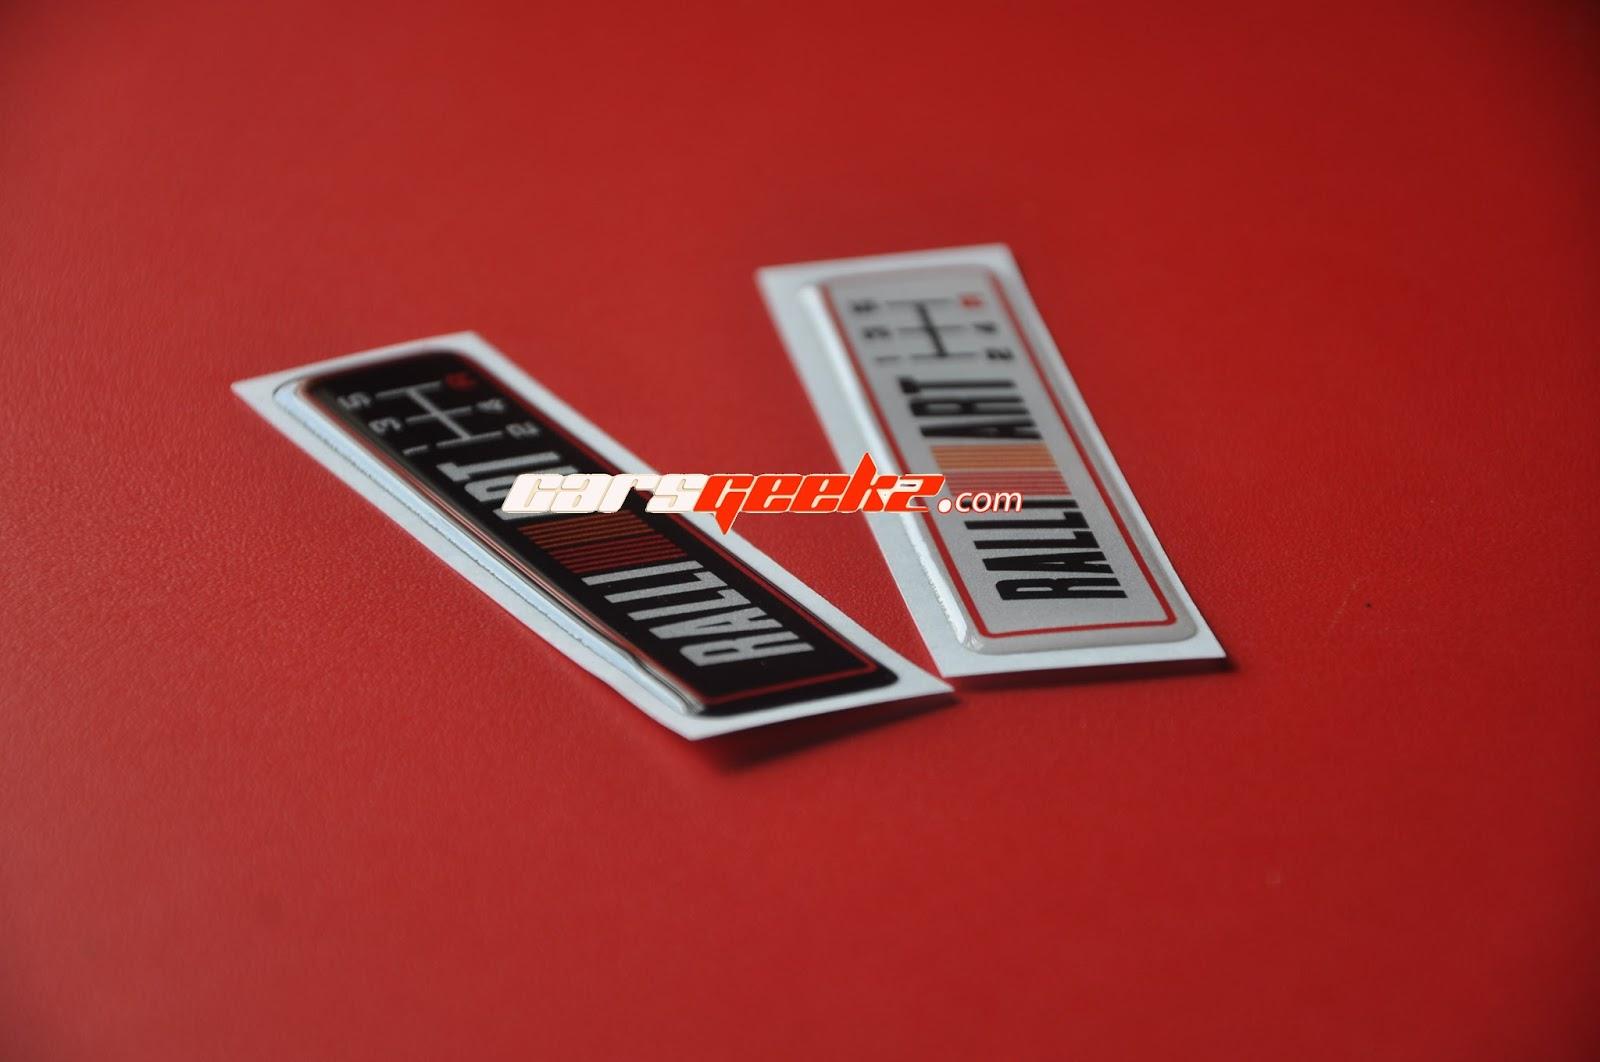 Ralliart 5 speed manual gear black badge sticker emblem mitsubishi suit evo gsr